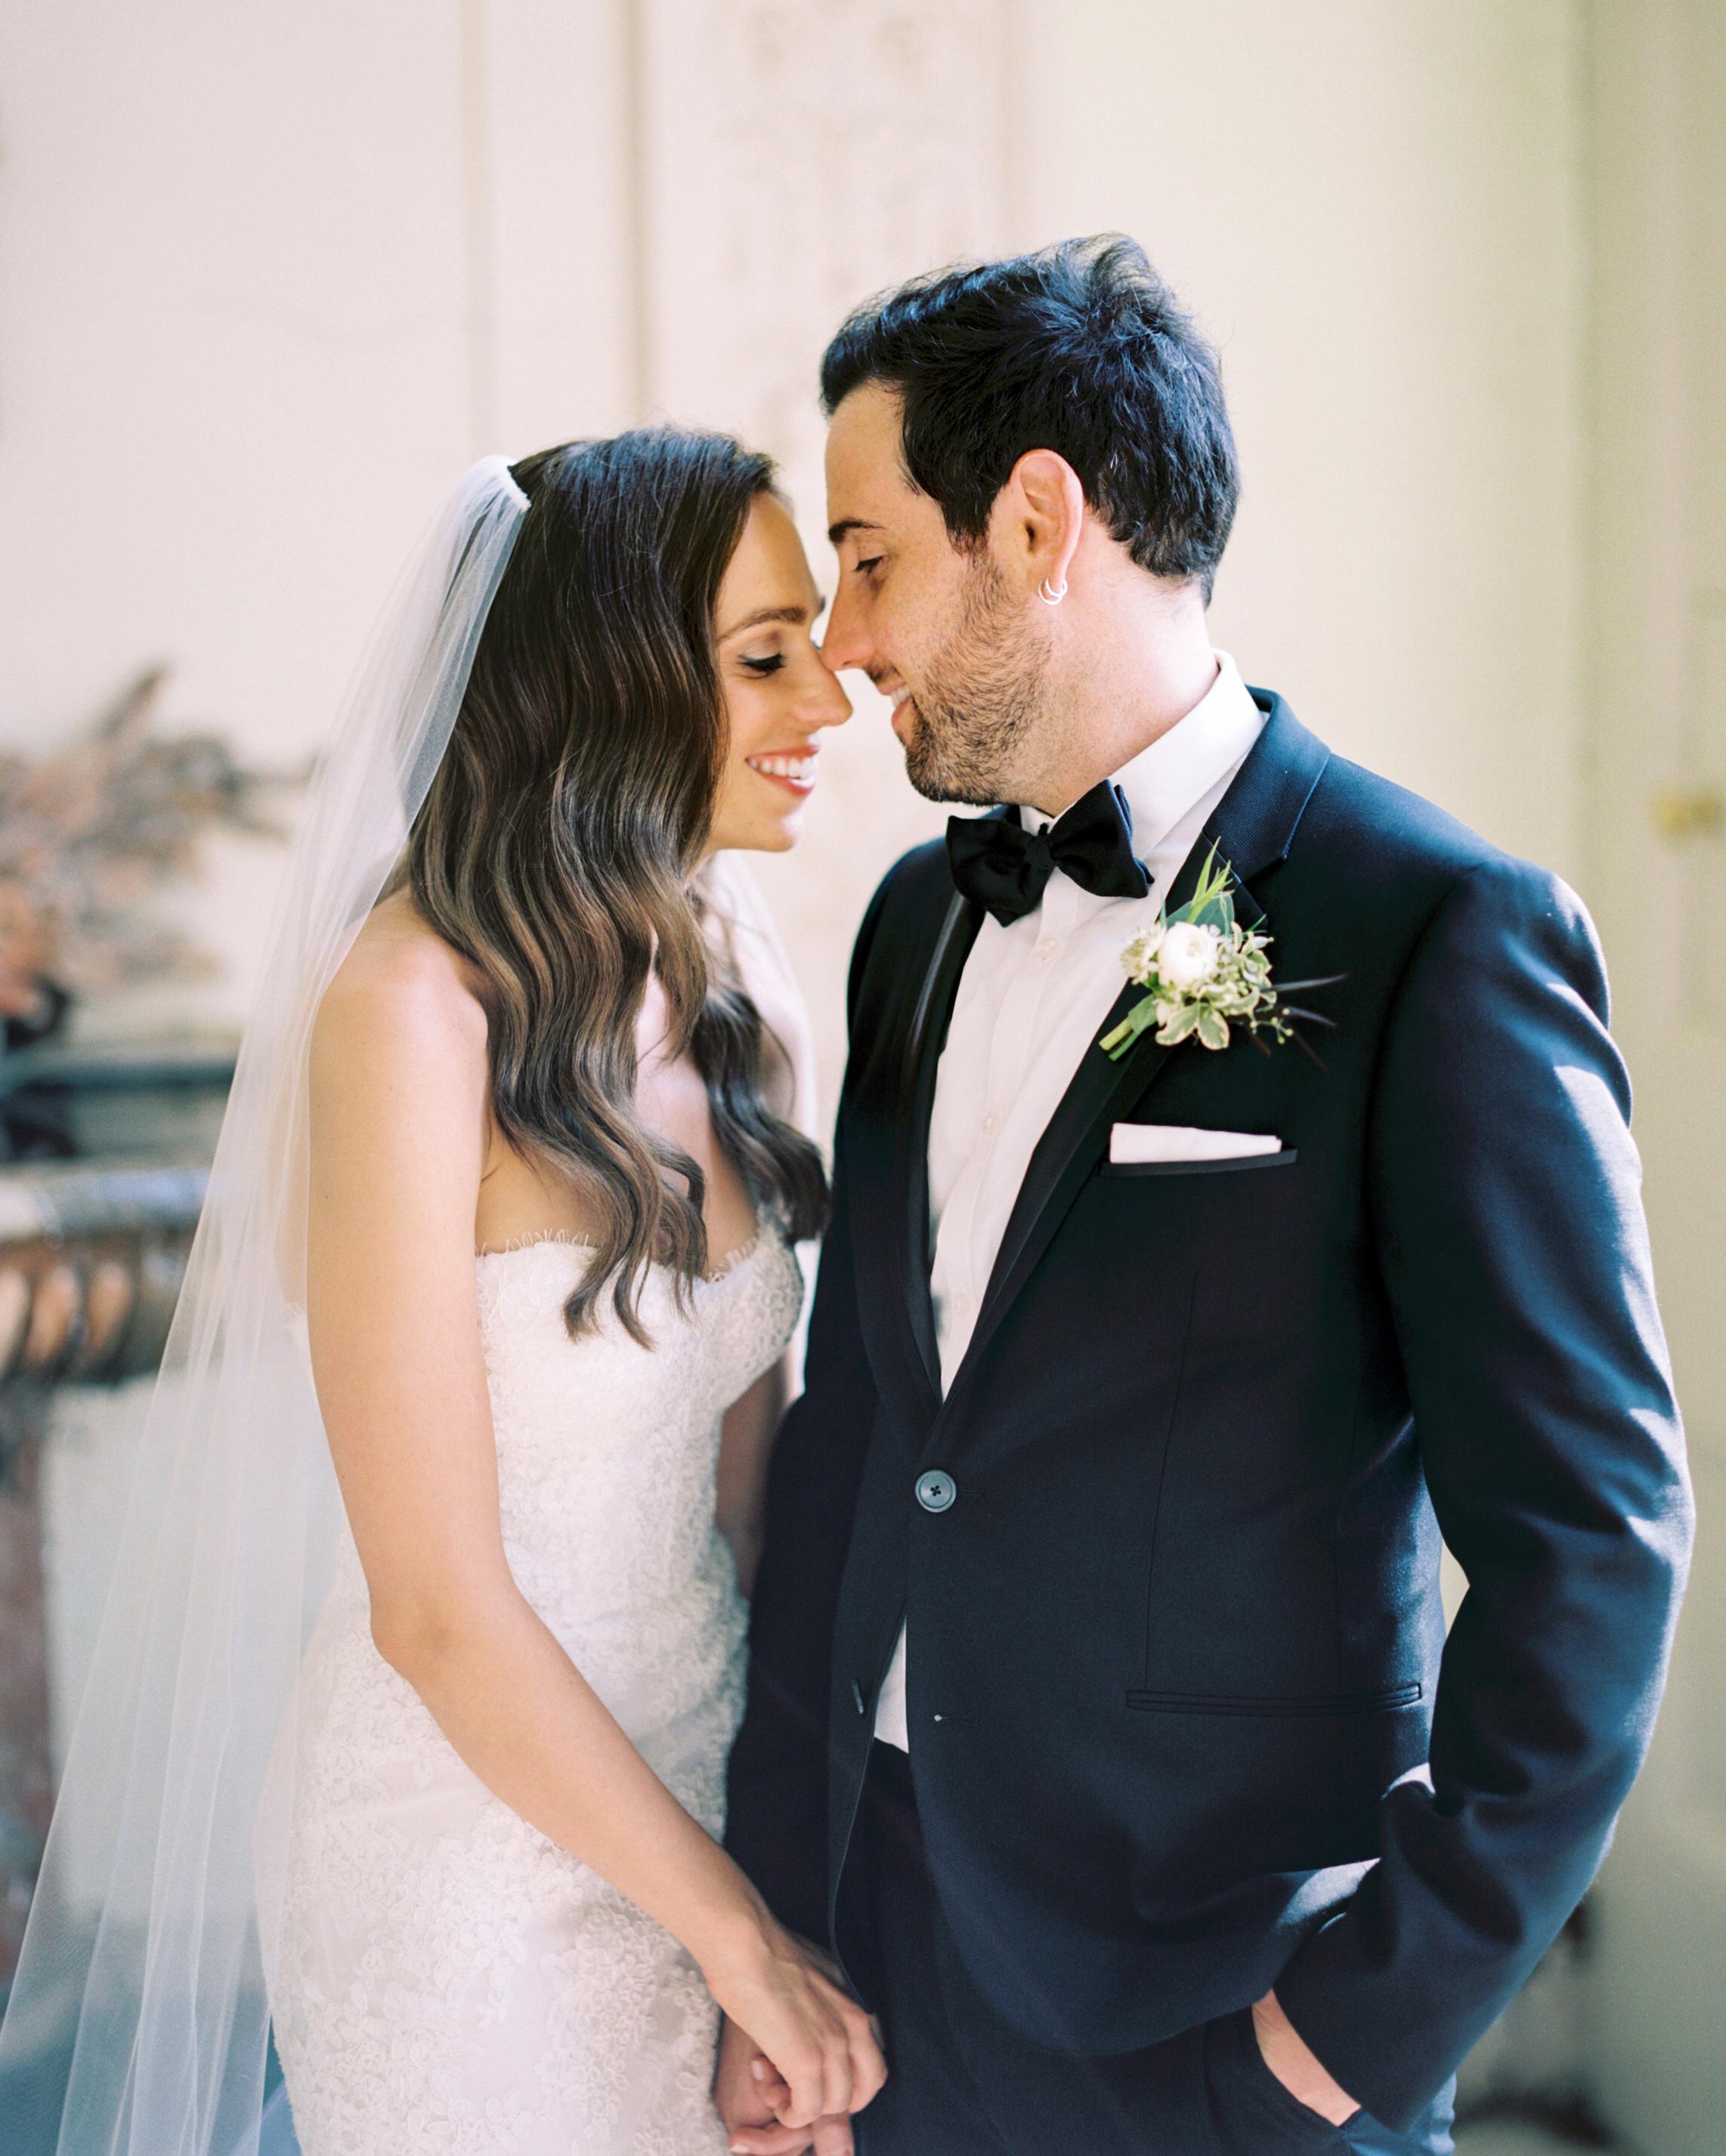 jackie-ross-wedding-couple-051-s111775-0215.jpg